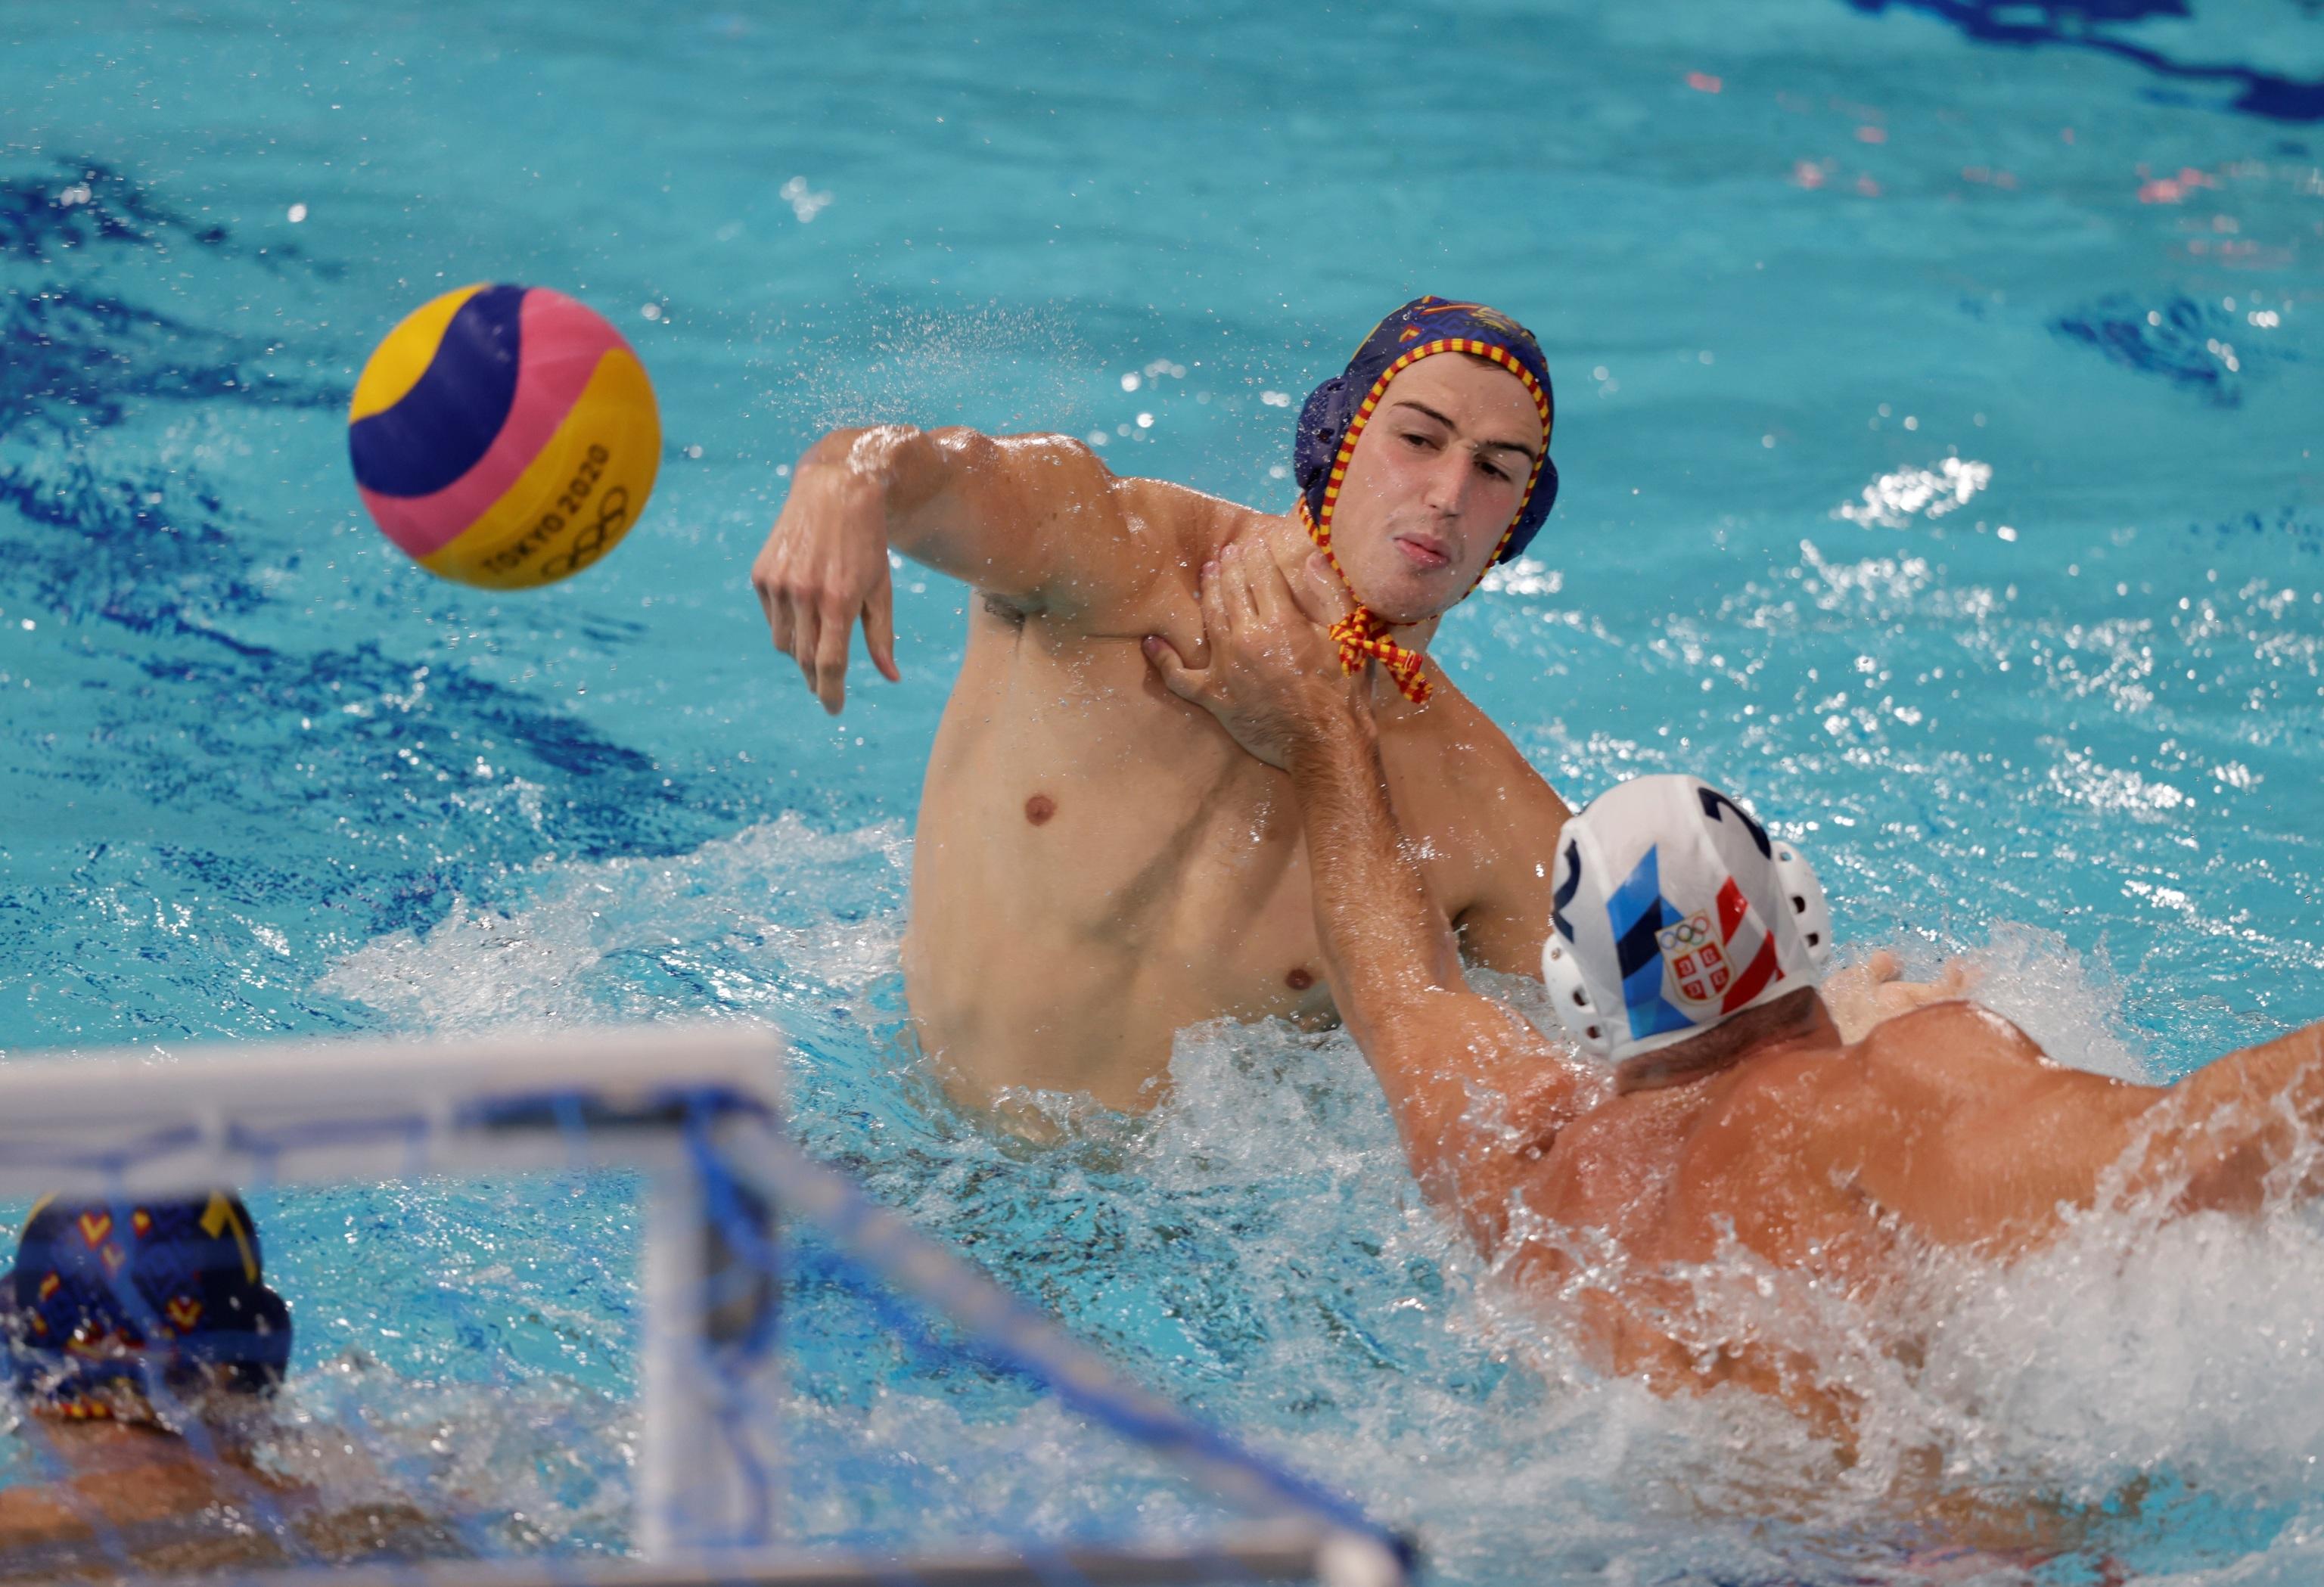 España Serbia - waterpolo - Juegos Olímpicos 2021 - Tokio 2020